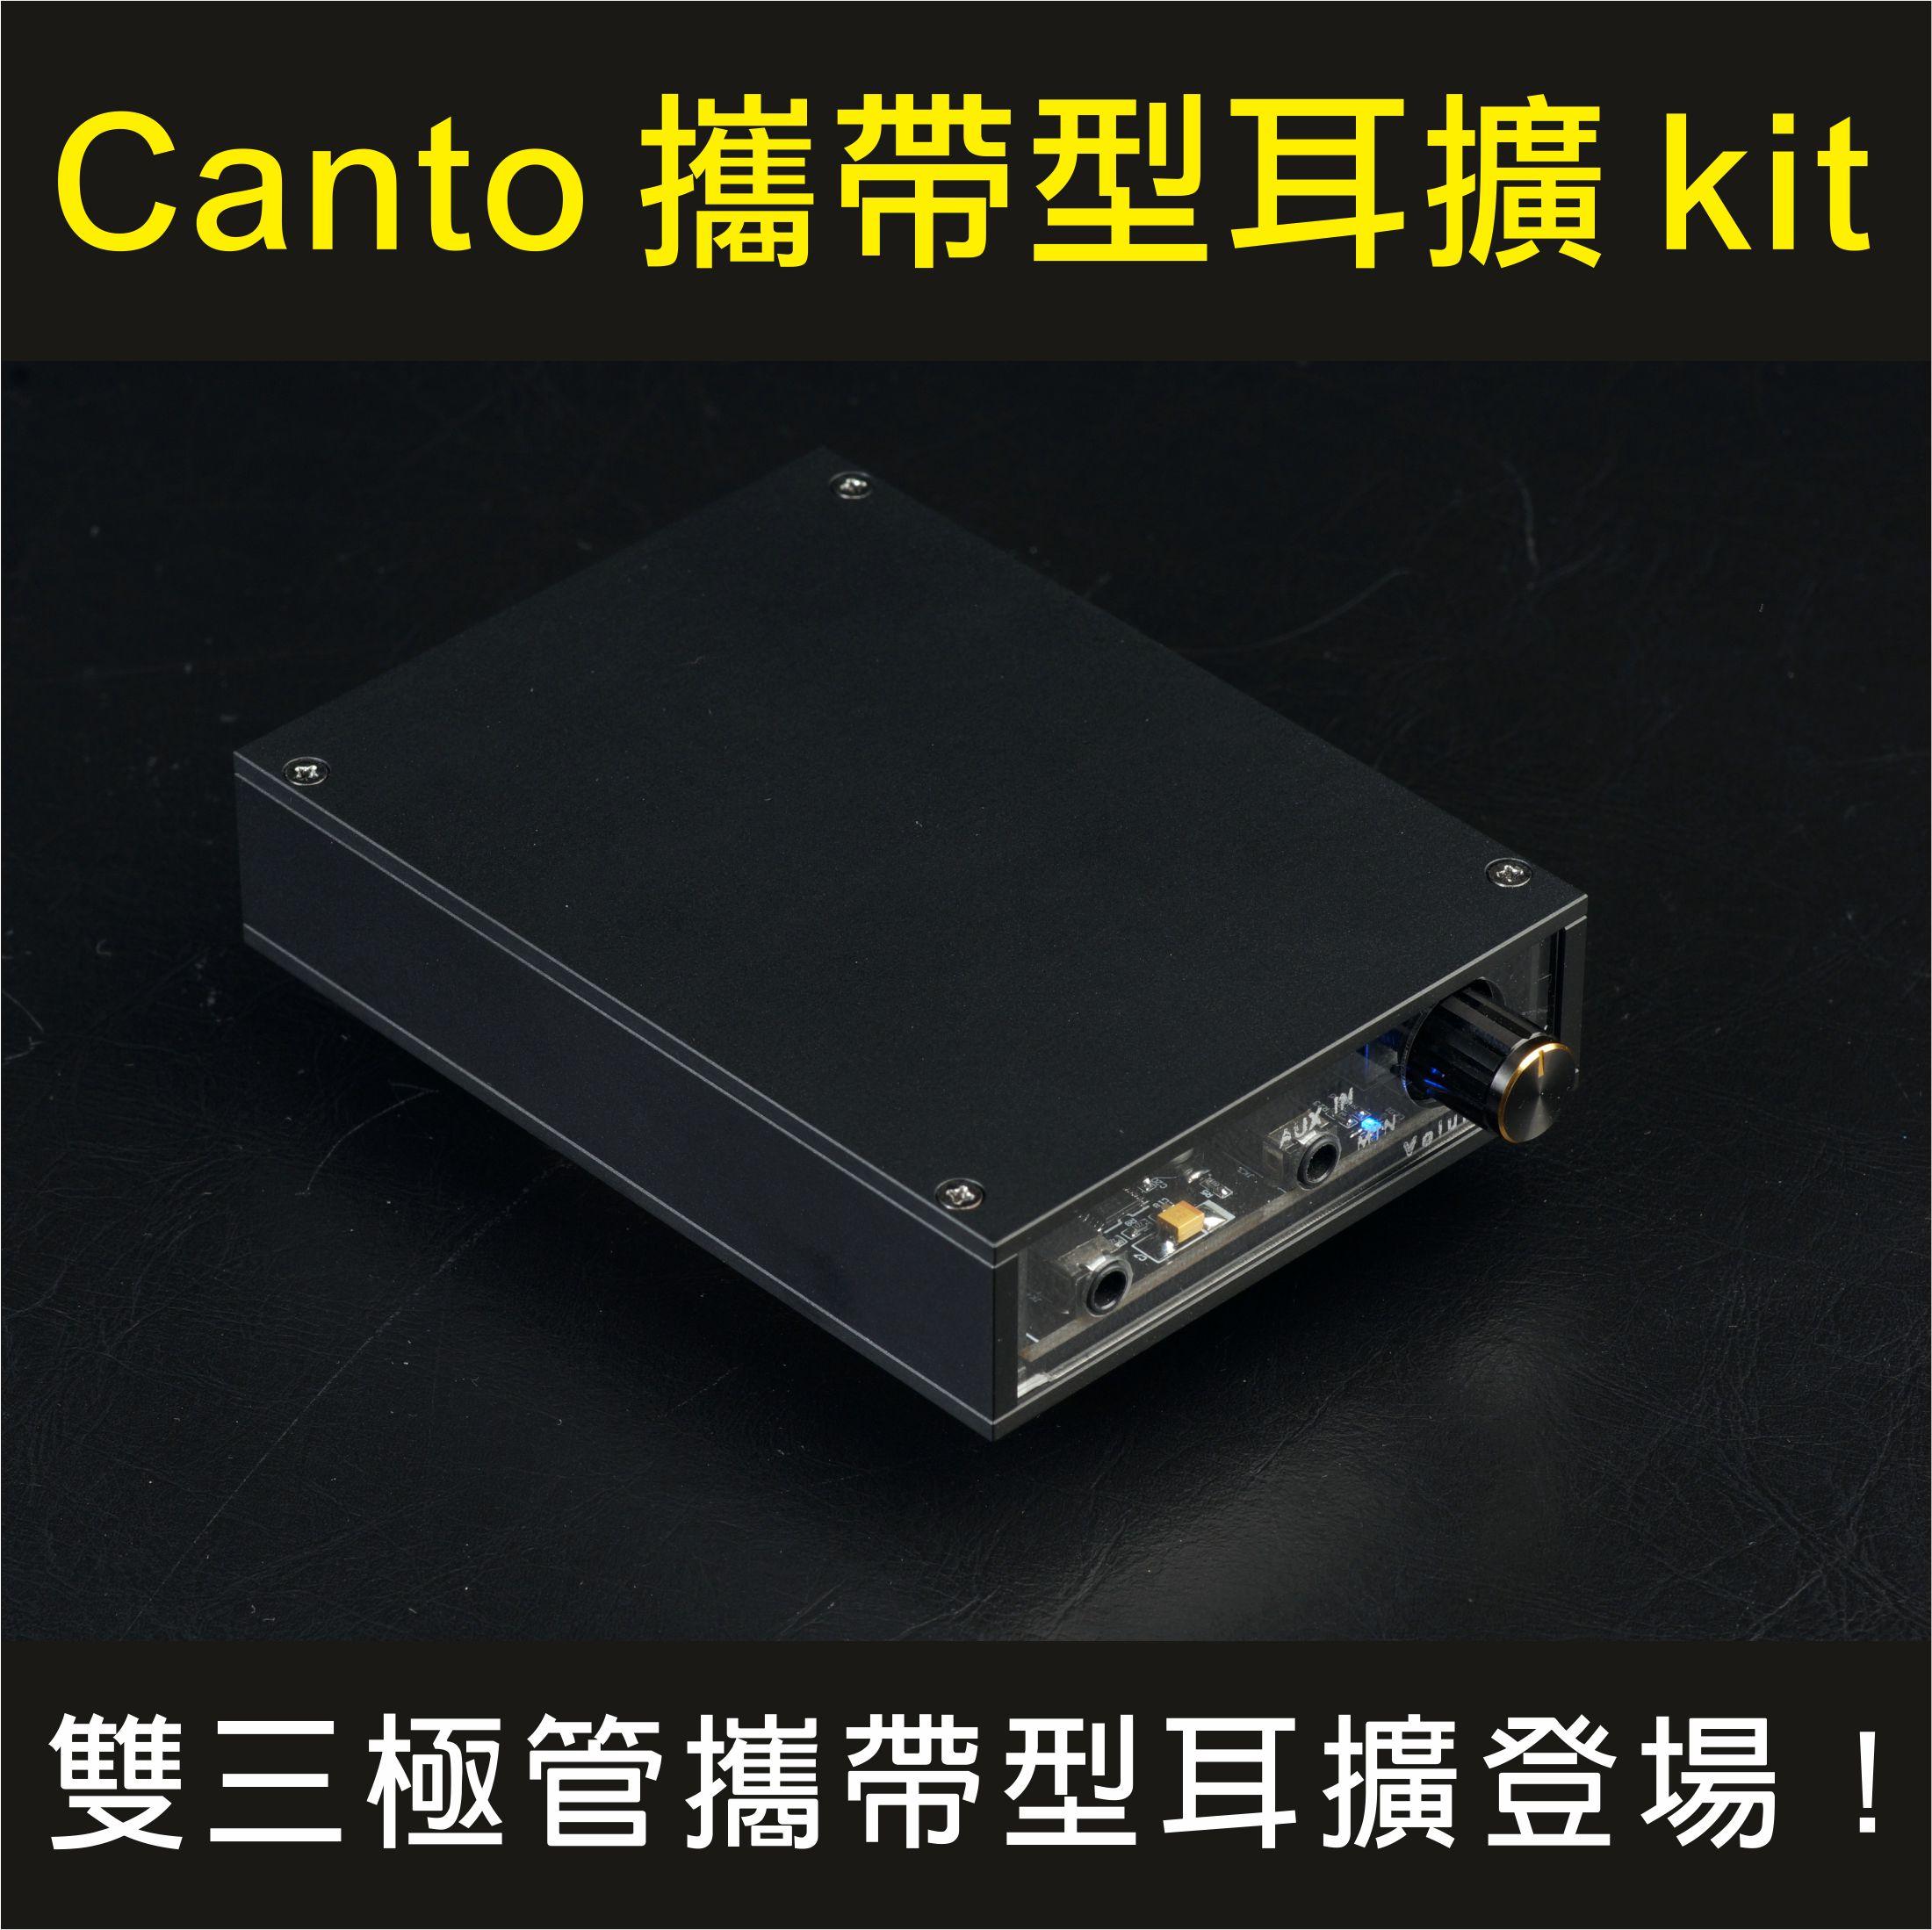 Canto攜帶型真空管耳擴kit【現貨供應中】